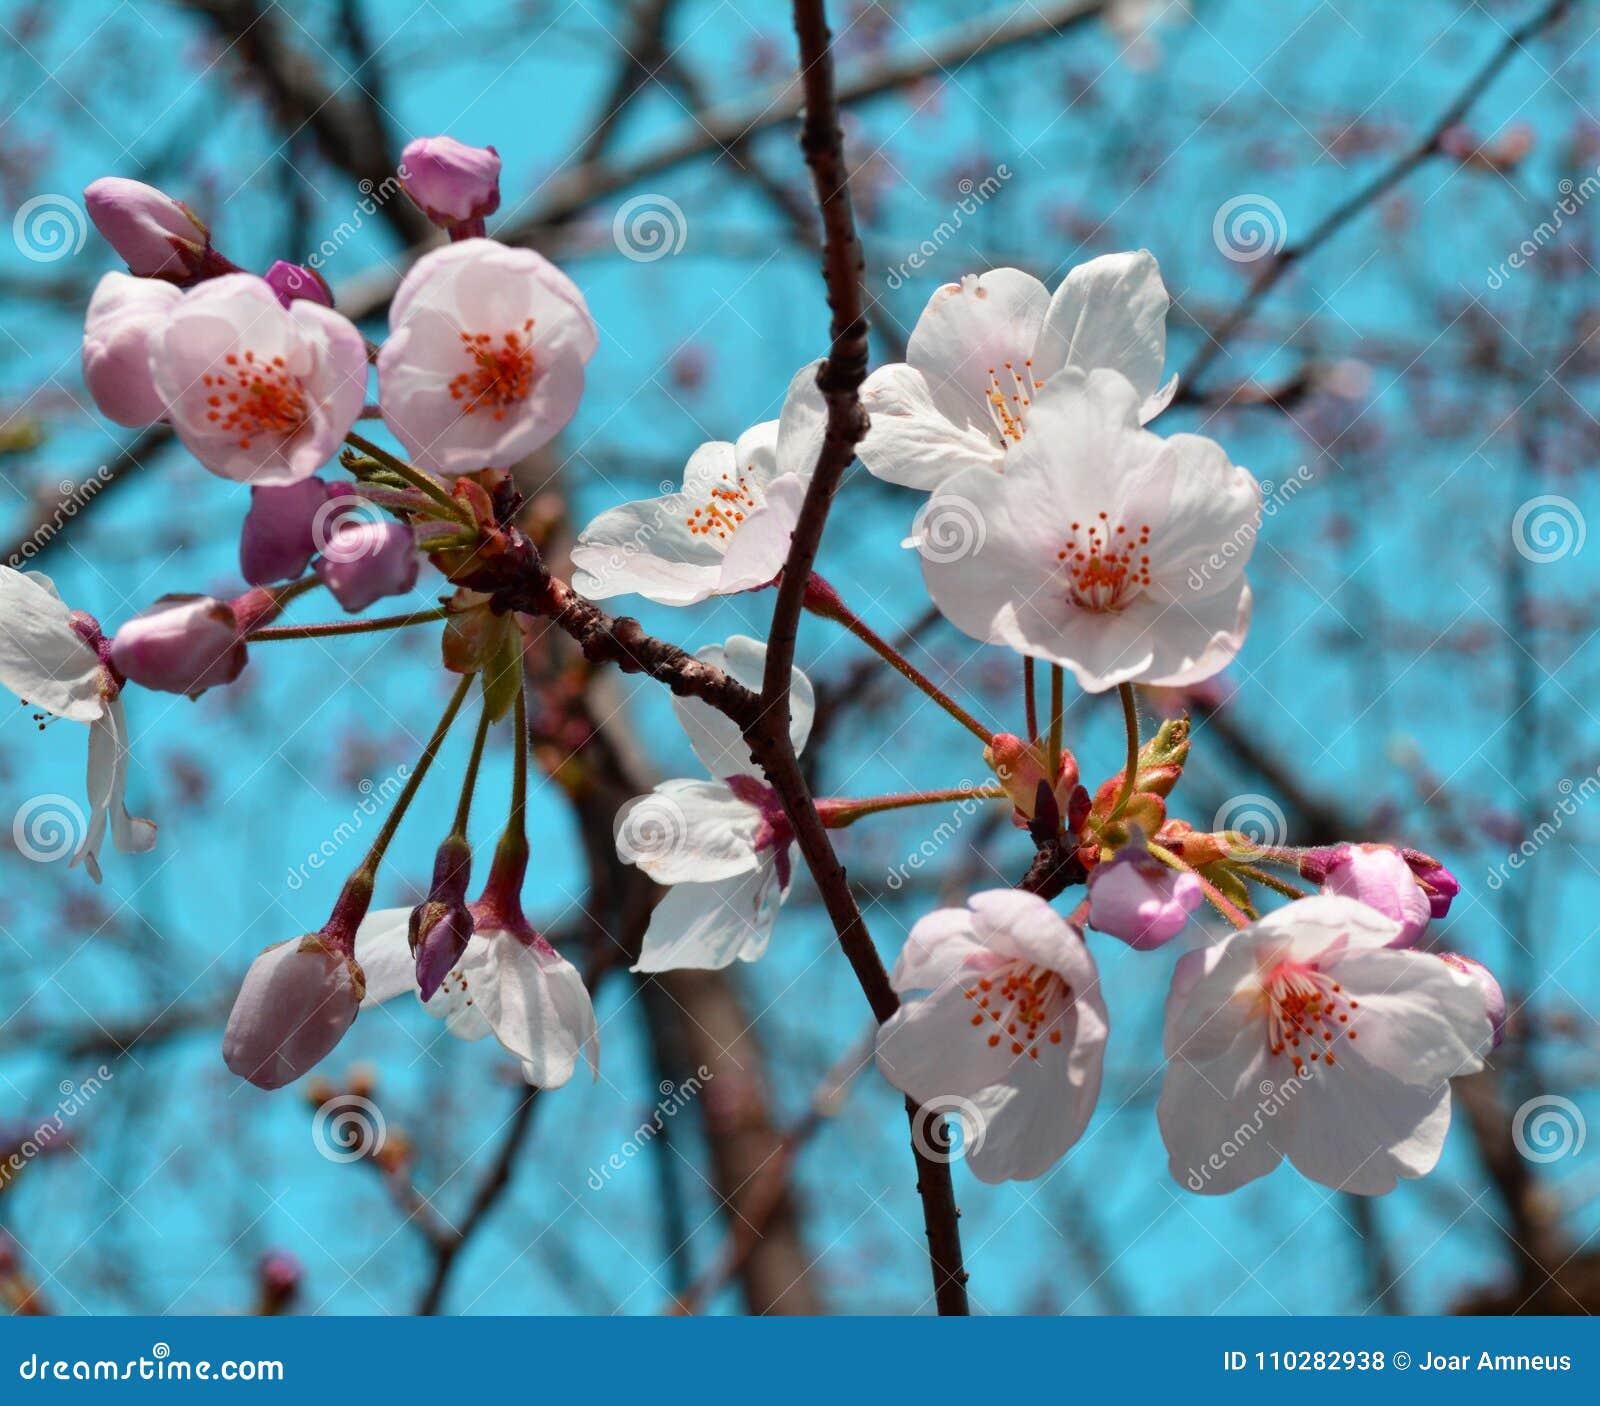 Early Spring Sakura Flowers Cherry Blossom Japan Stock Photo